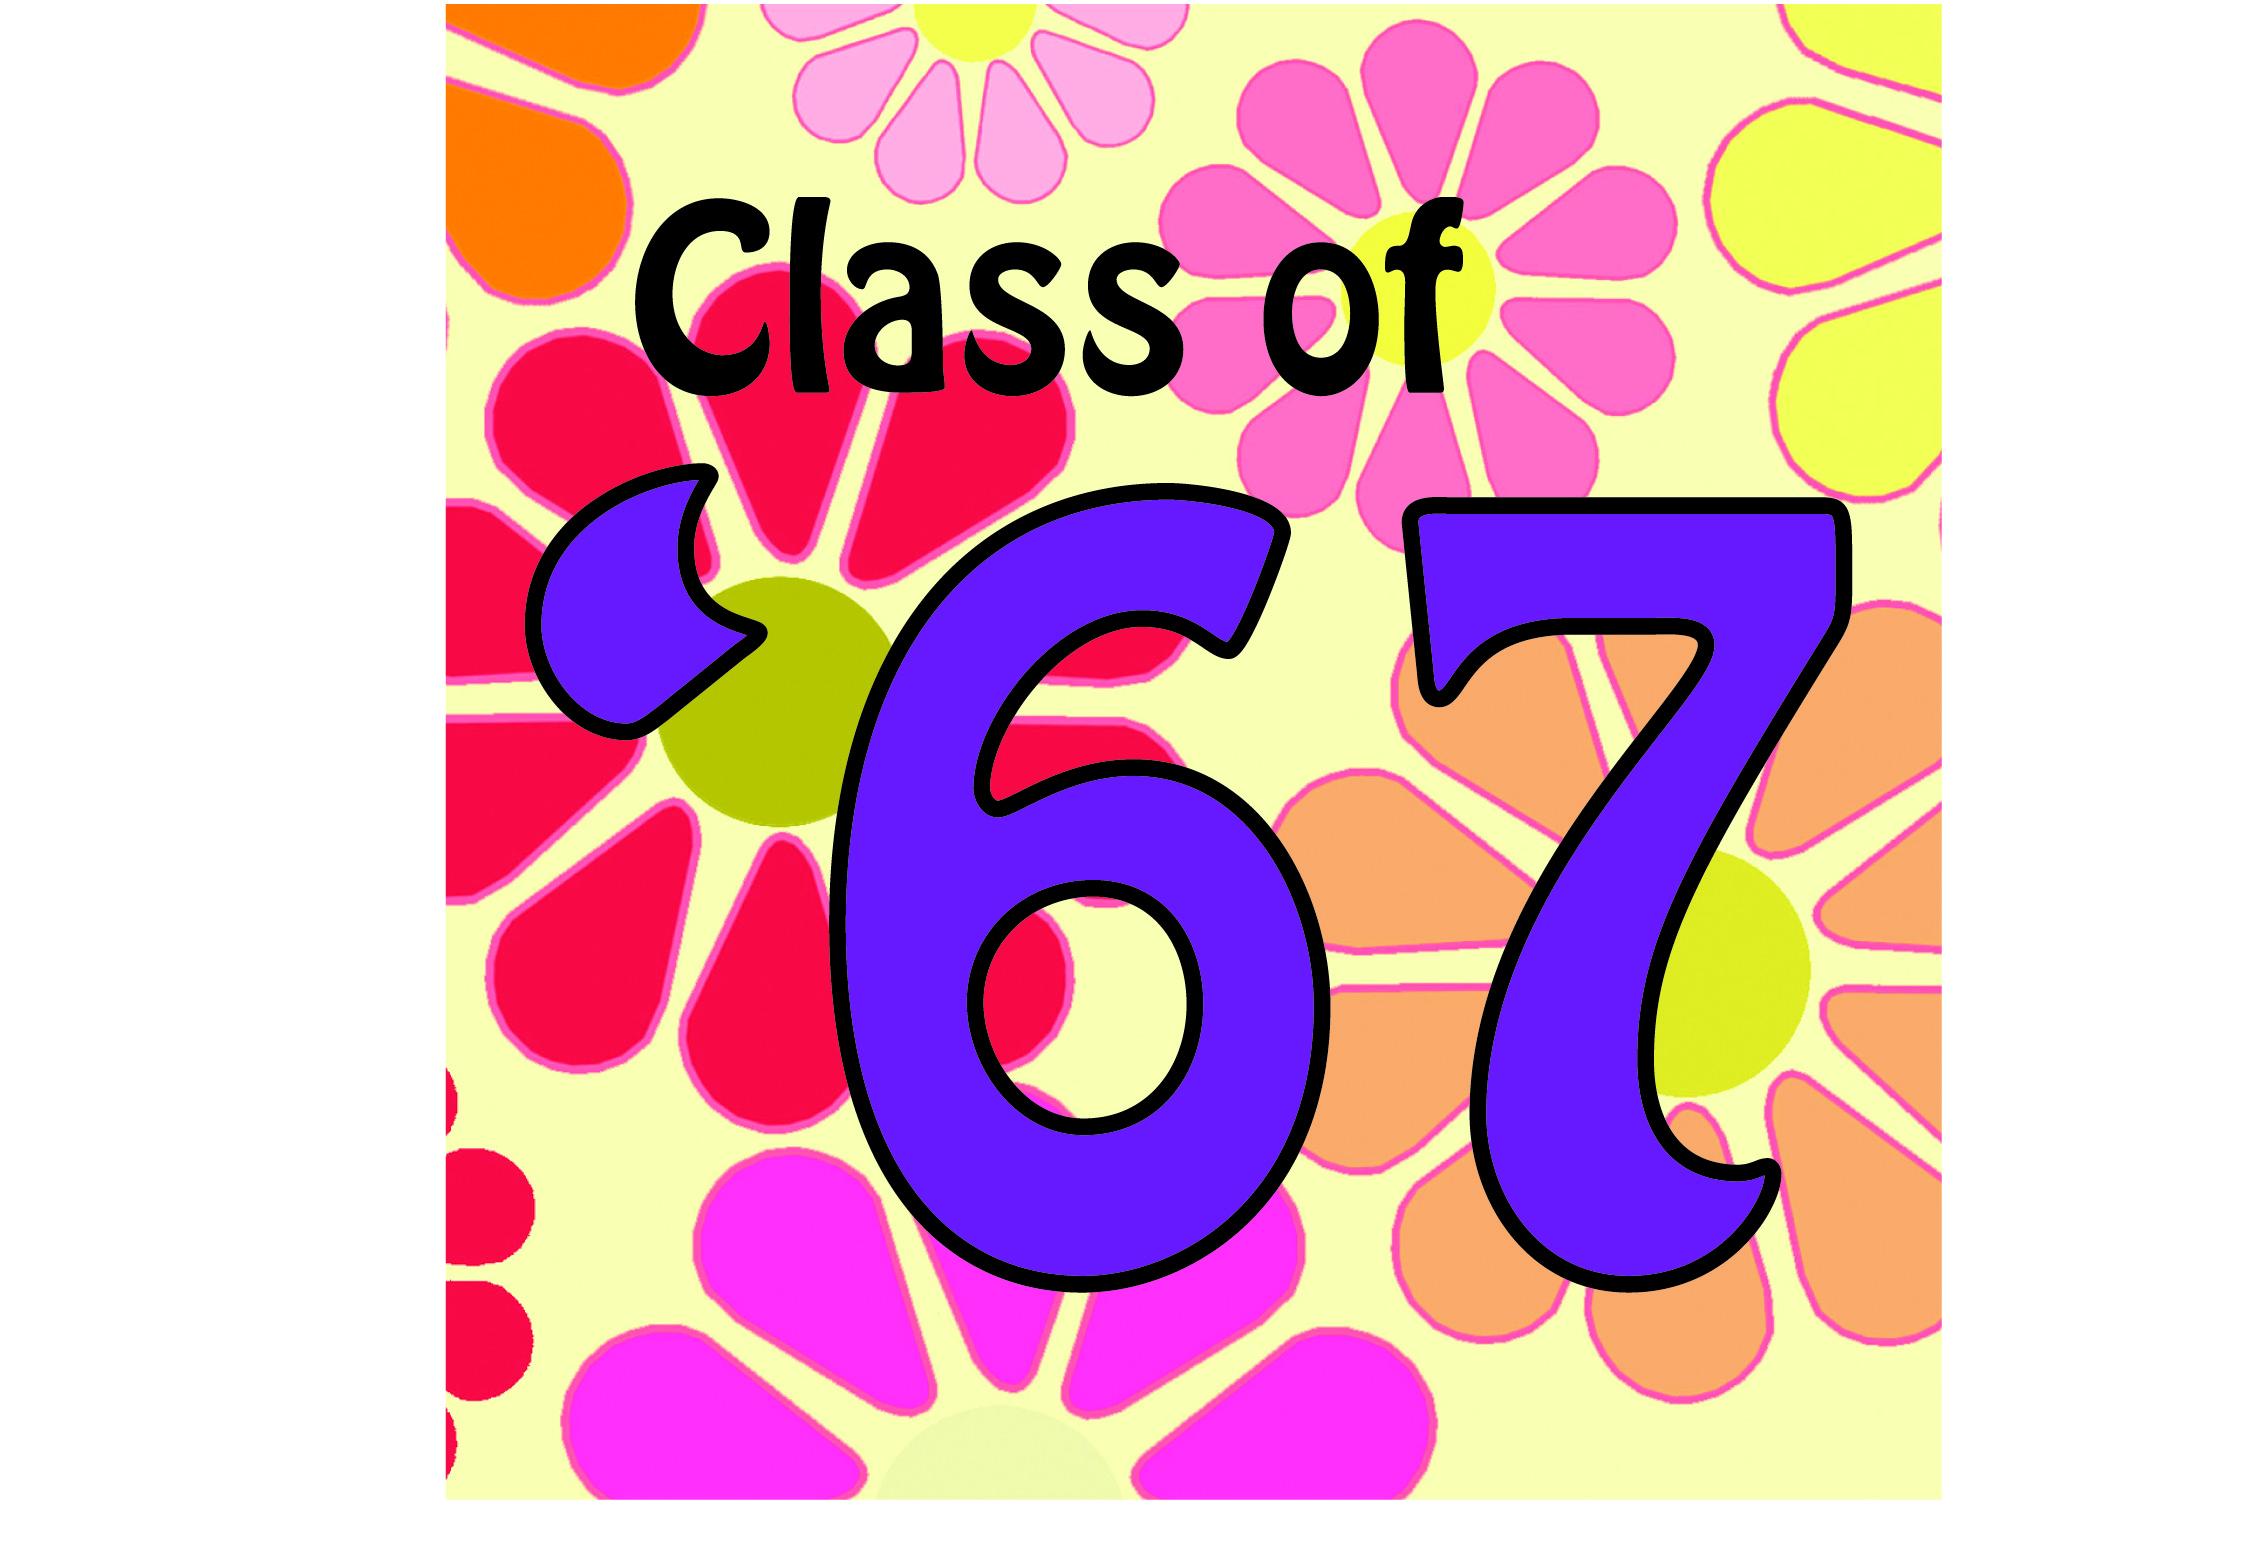 Class_of_67